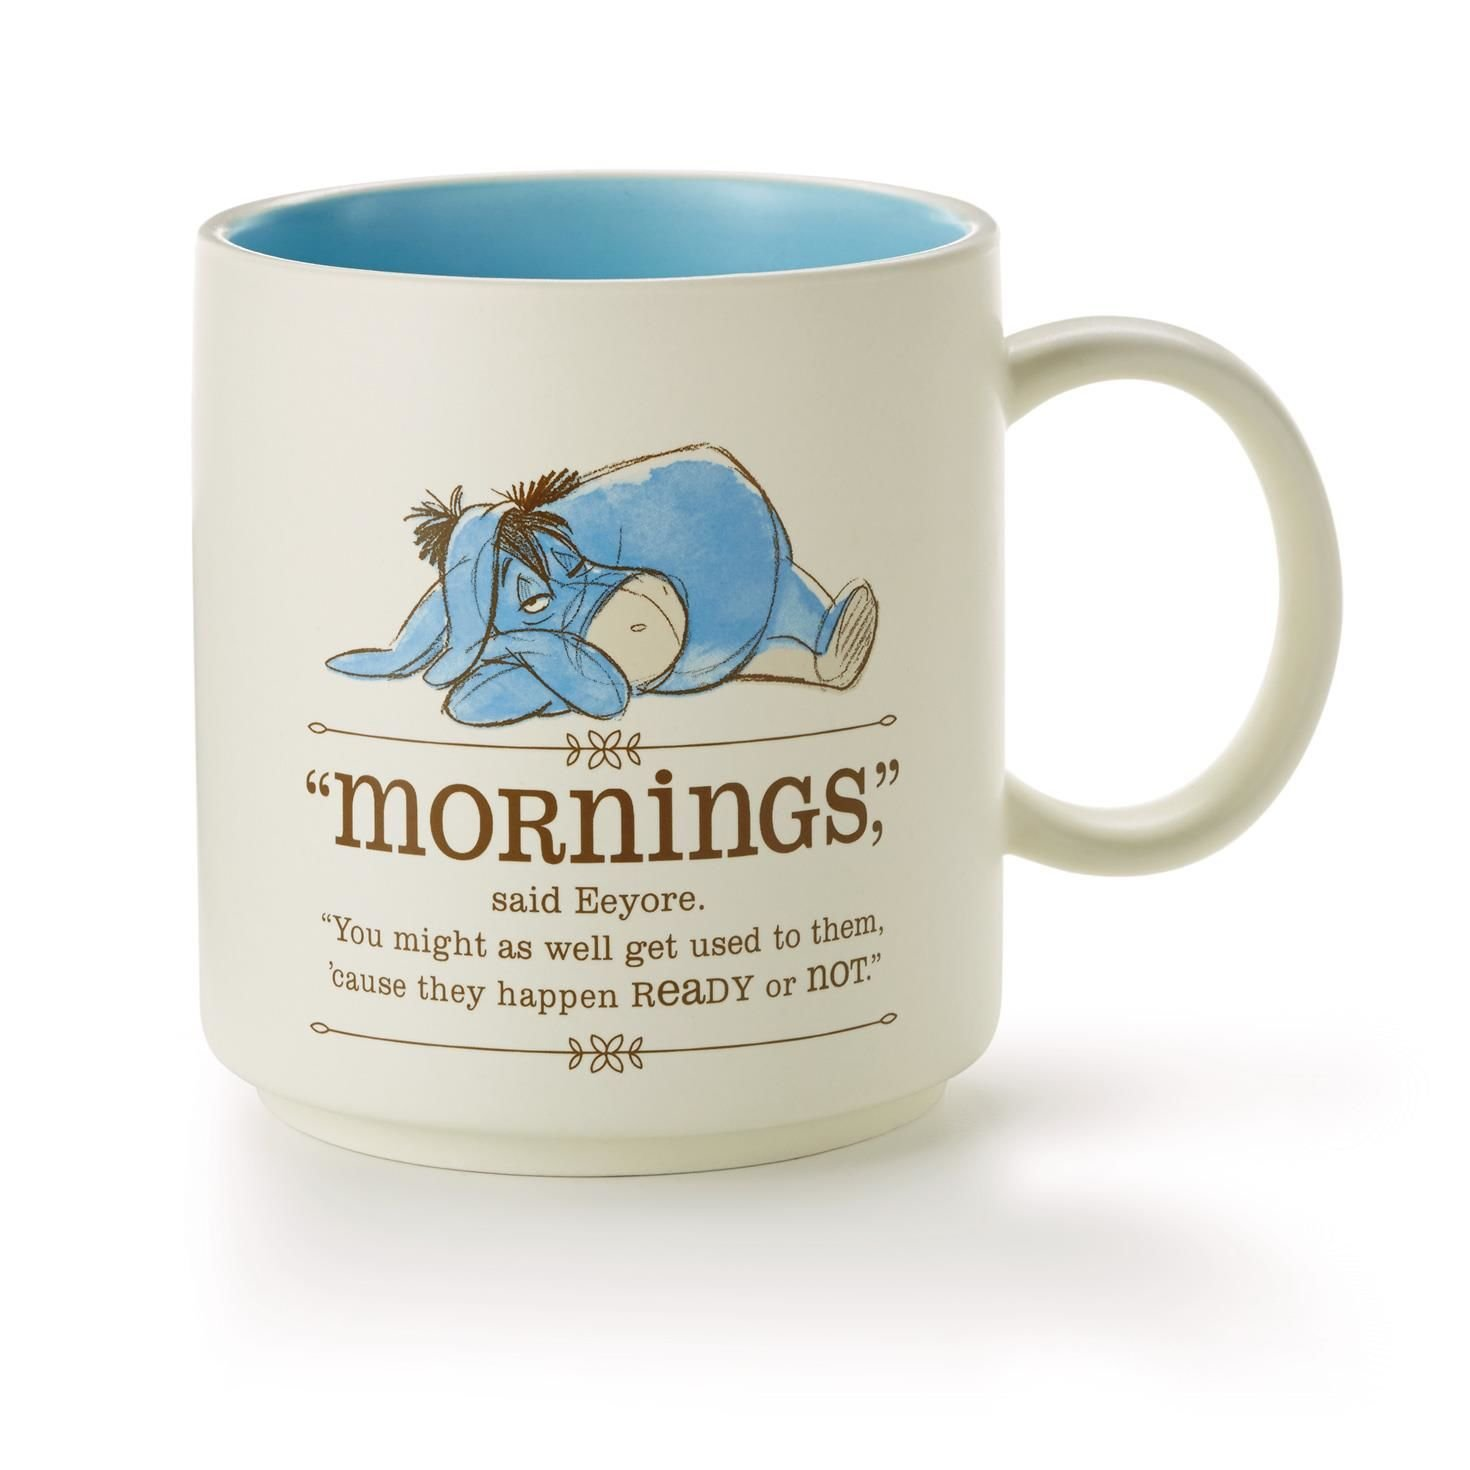 Eeyore ''Mornings'' Coffee Mug from Winnie the Pooh